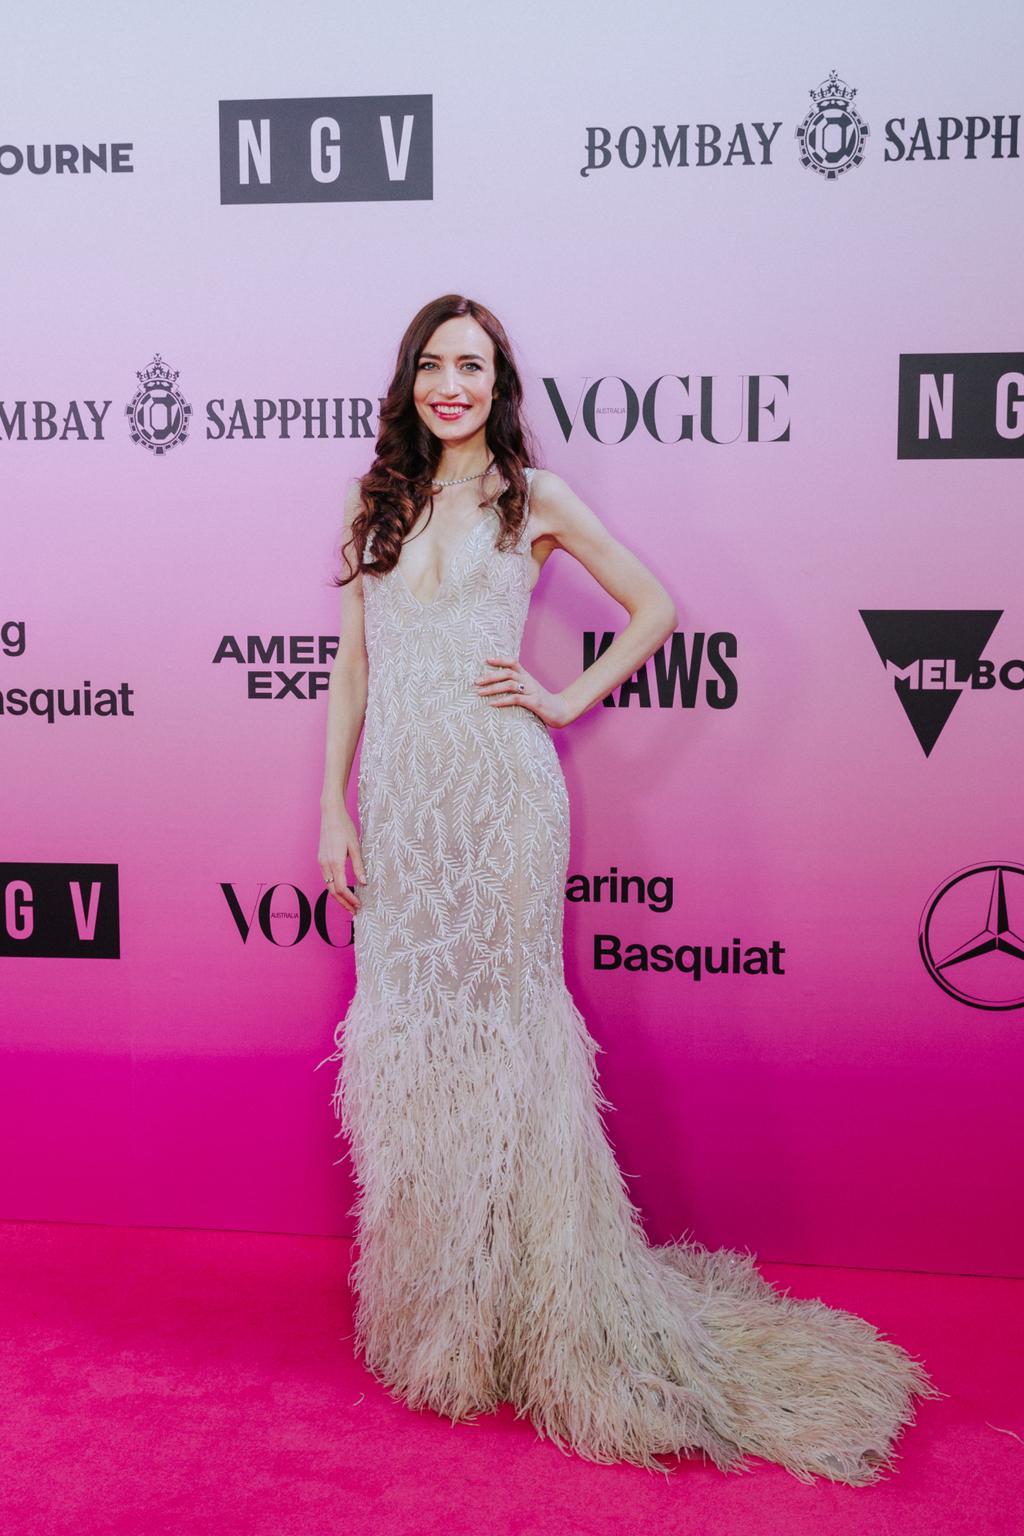 lizzy-jagger-in-paolo-sebastian-2019-ngv-gala-in-melbourne-australia